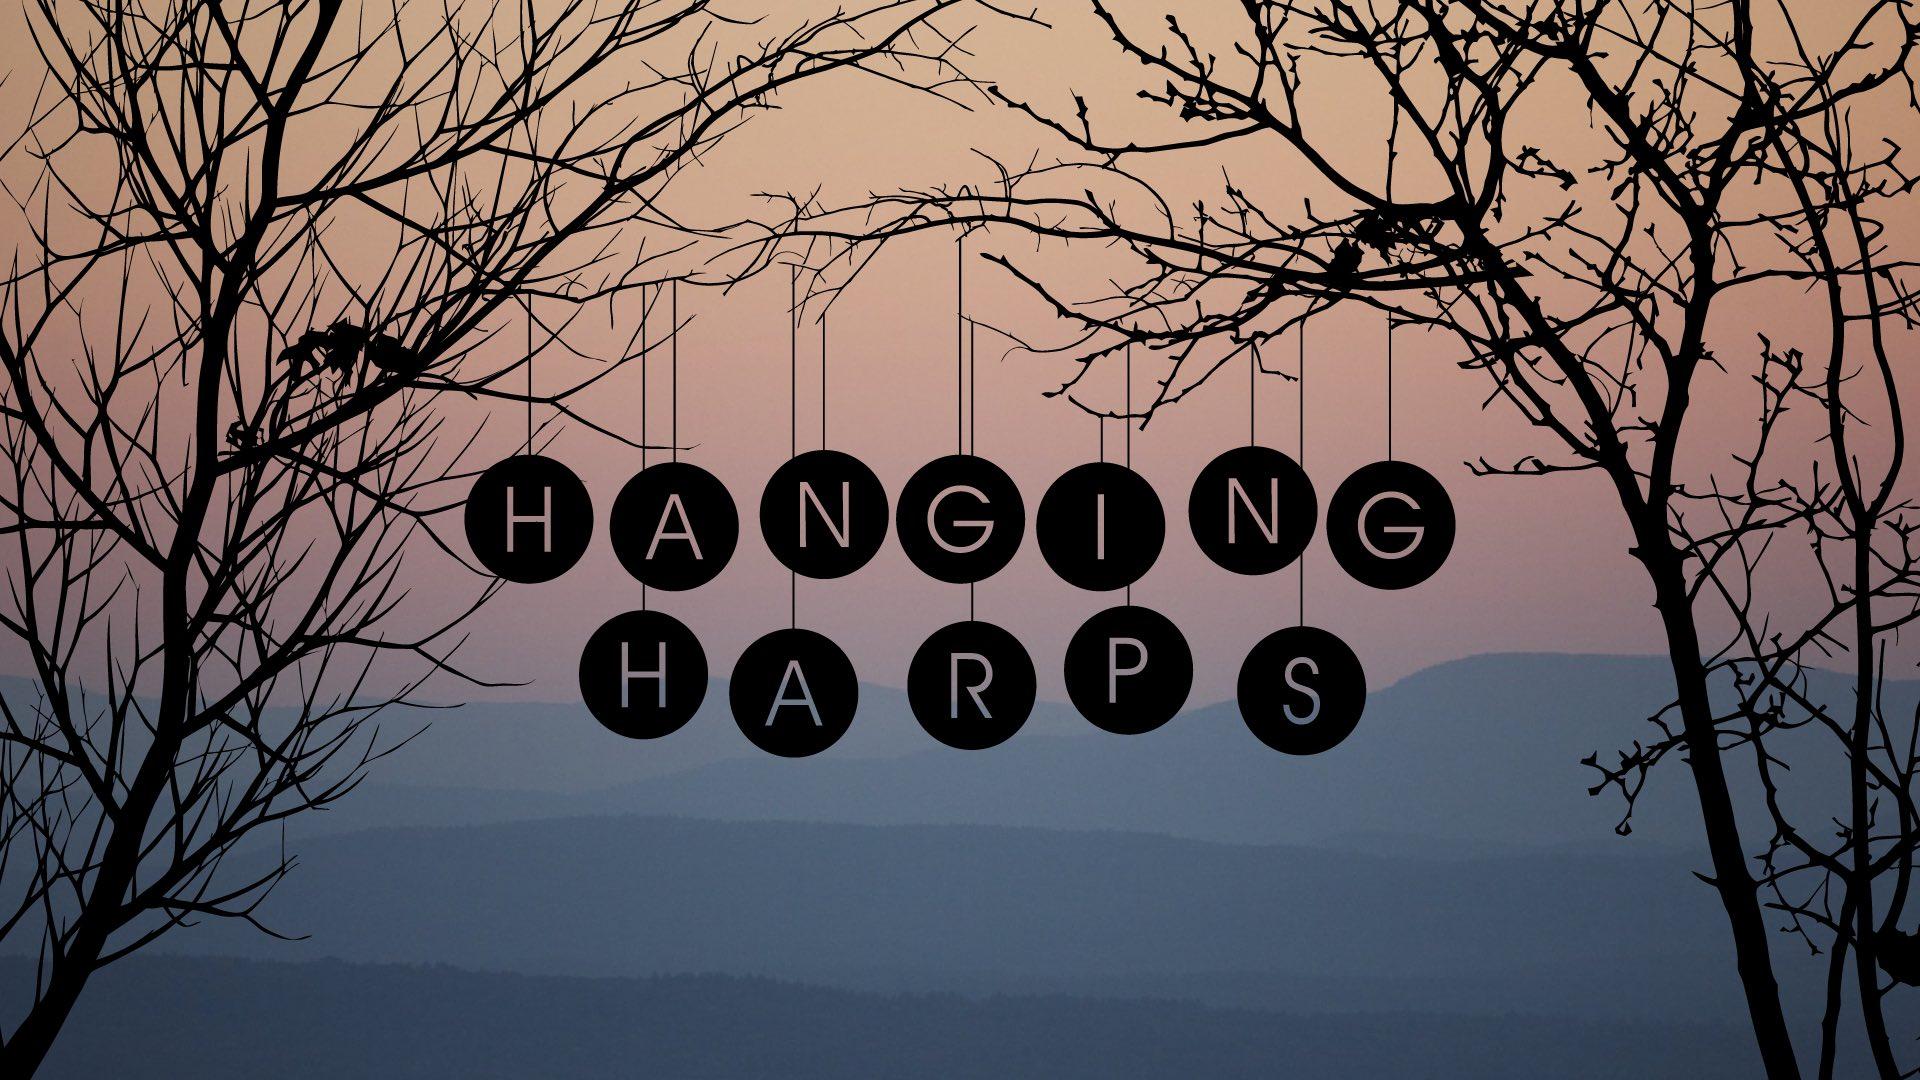 Hanging Harps